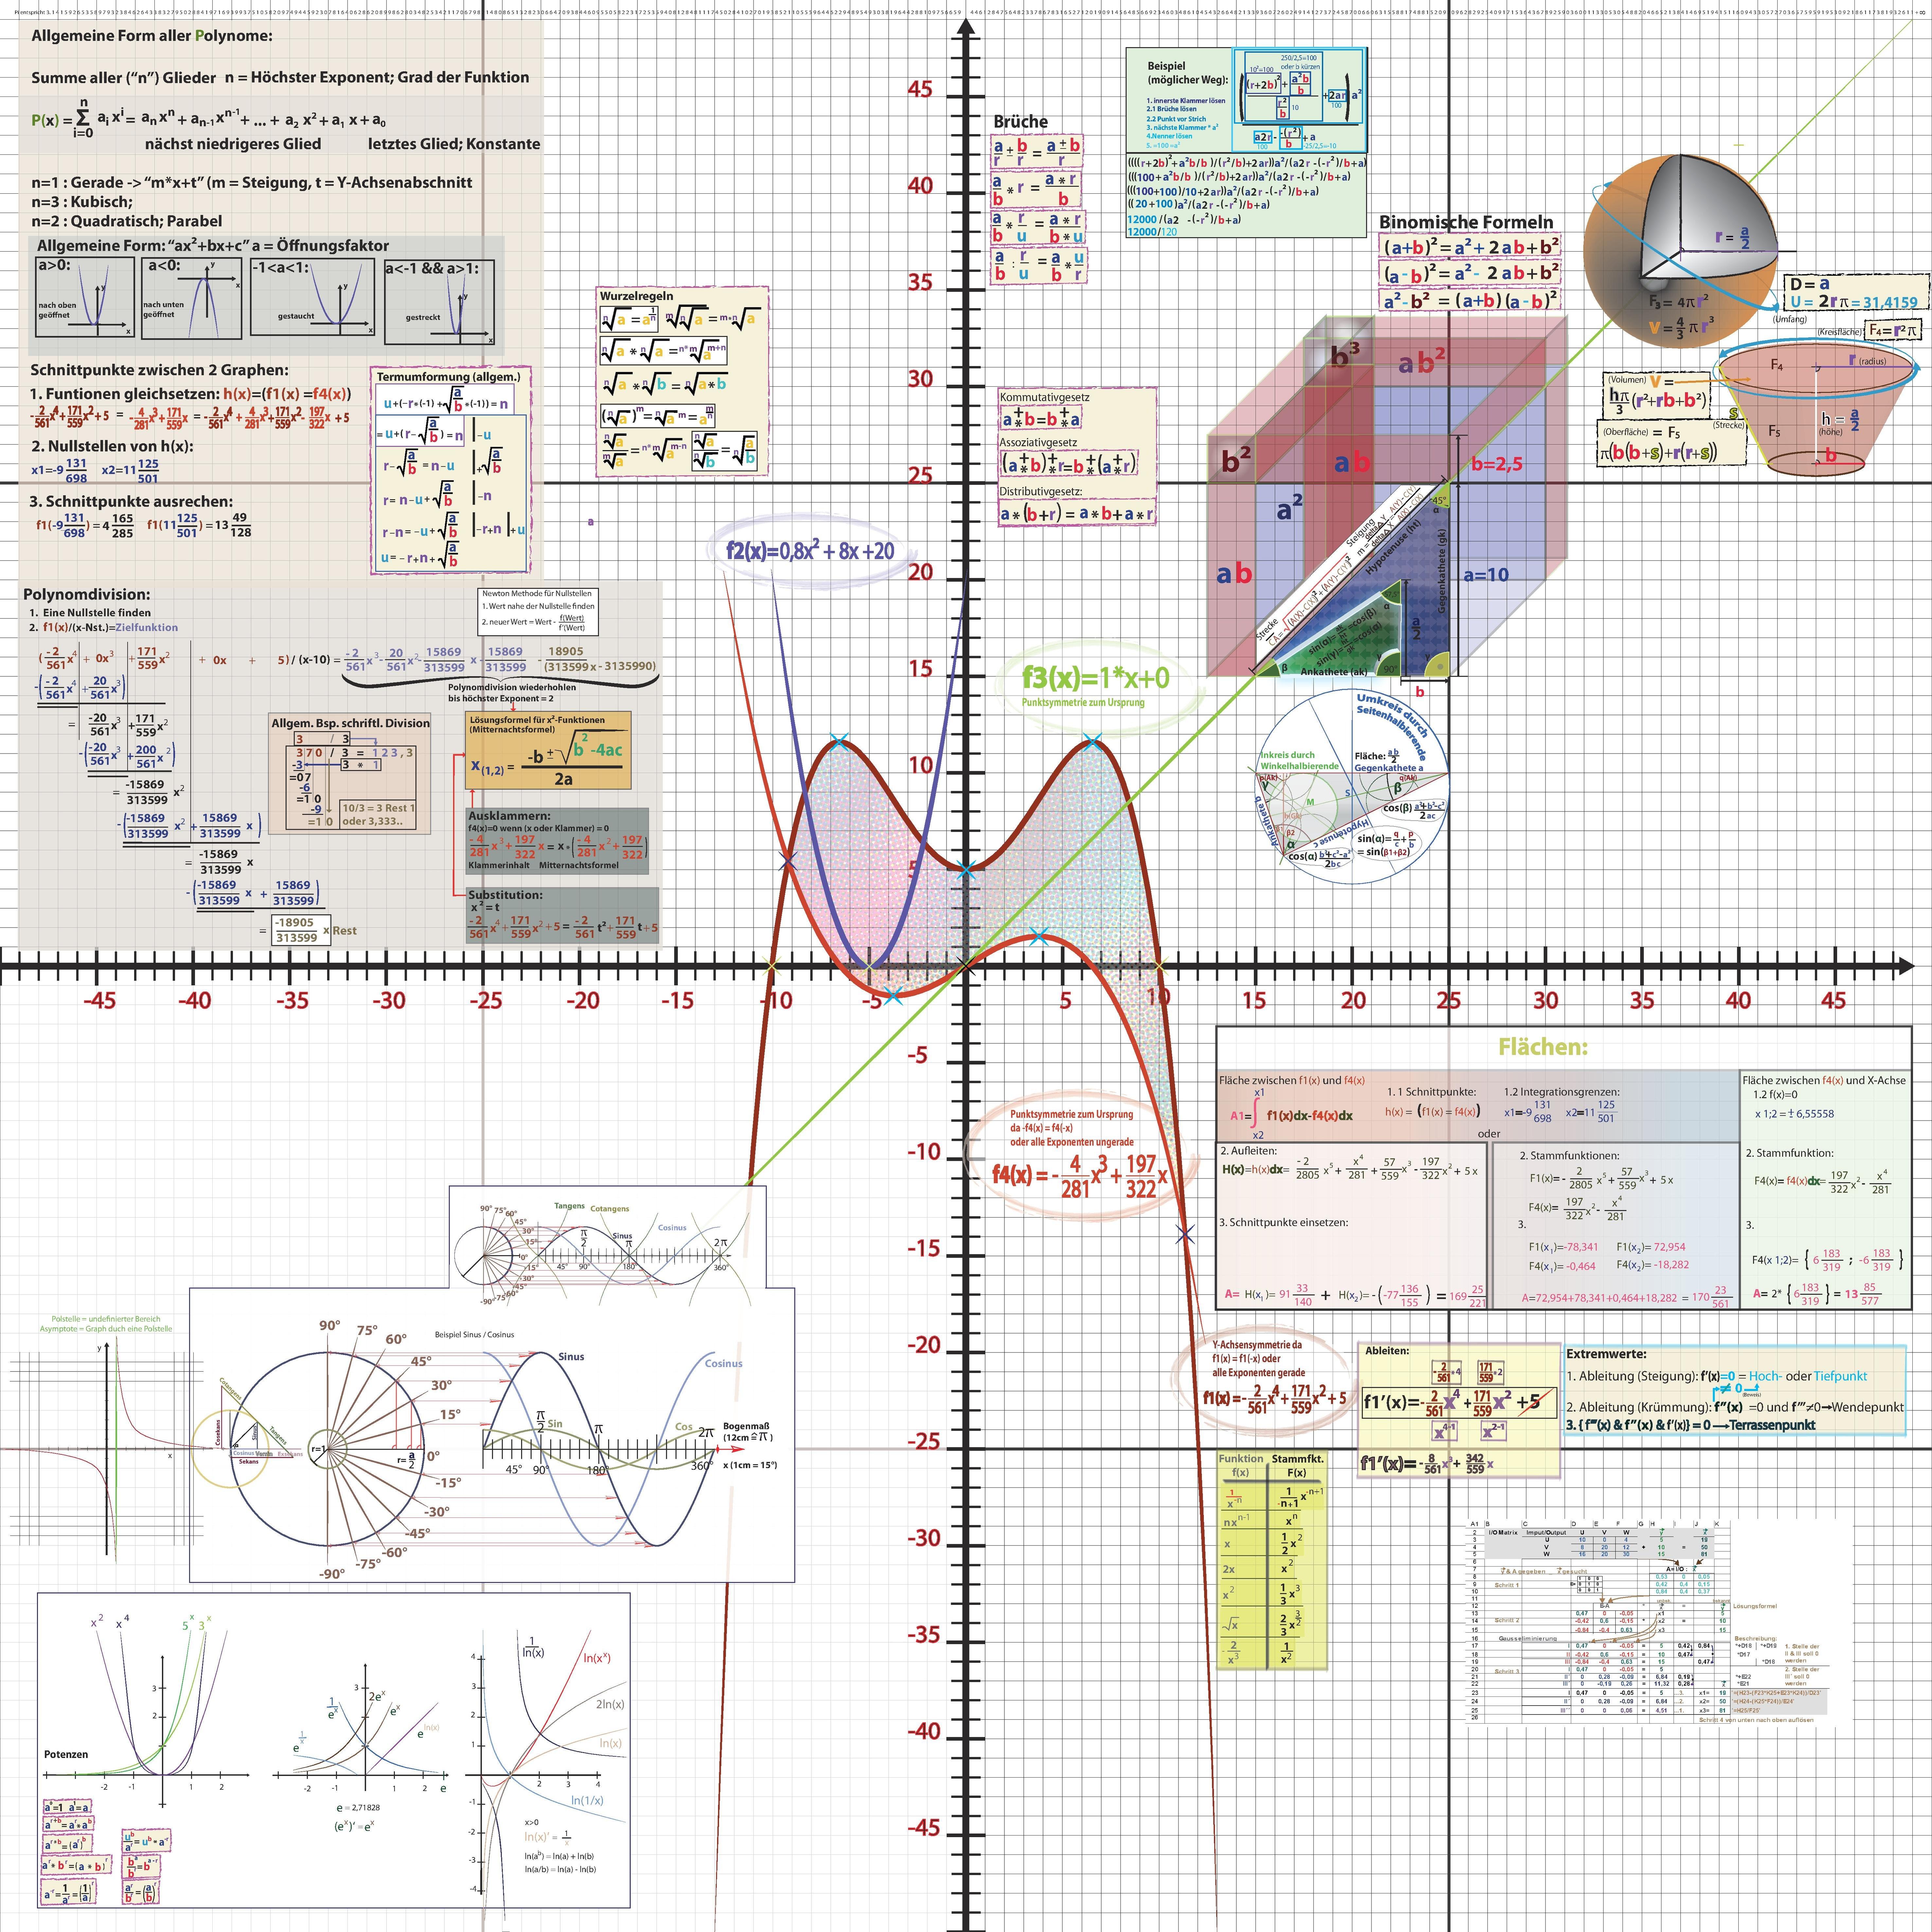 File:Mathematik Zusammenfassung 1x1m Beta.pdf - Wikimedia Commons